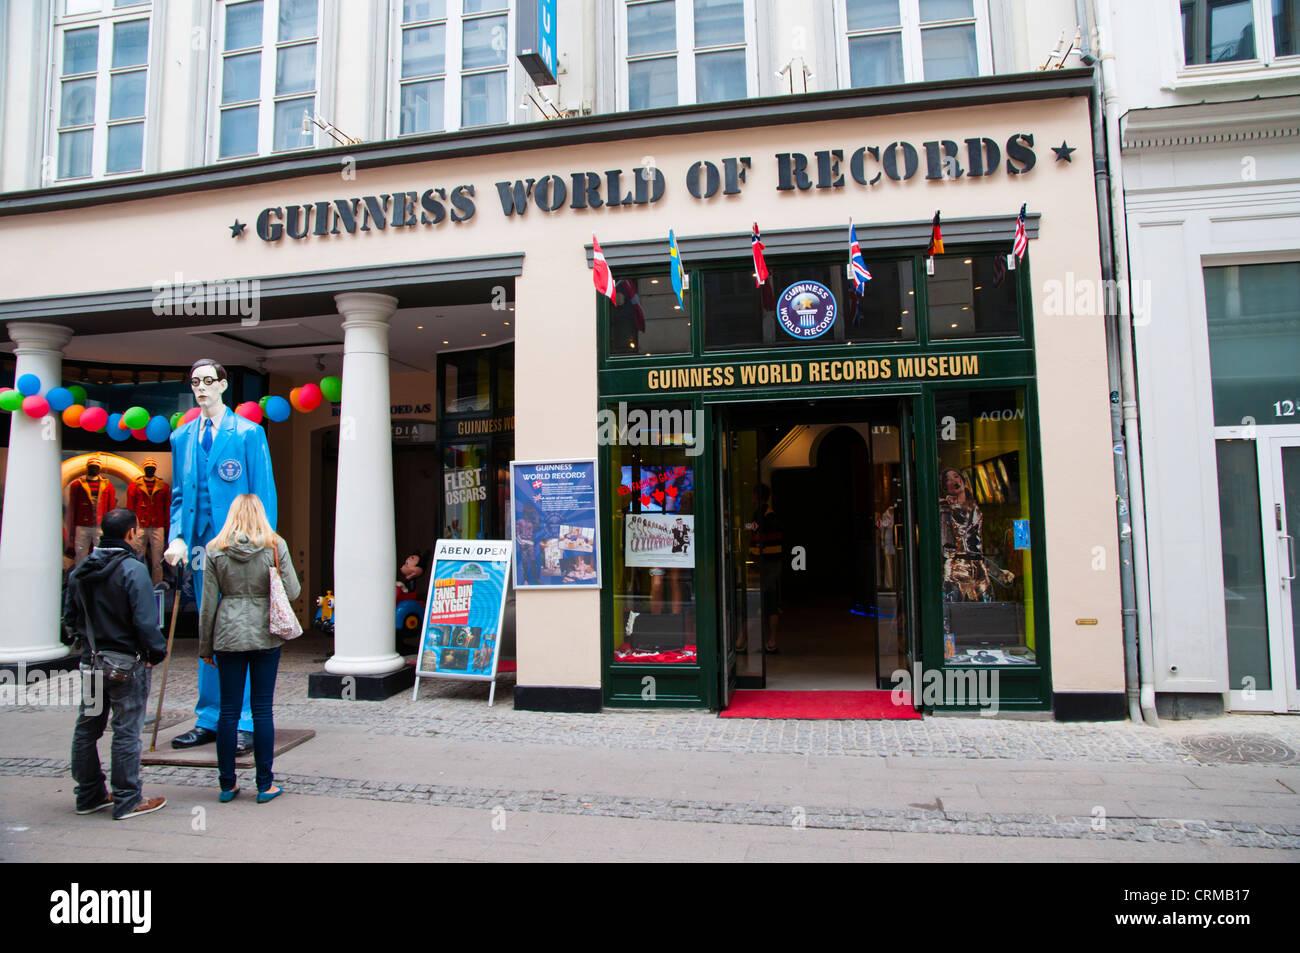 Guinness World of Records museum Stroget main pedestrian street Copenhagen Denmark Europe - Stock Image